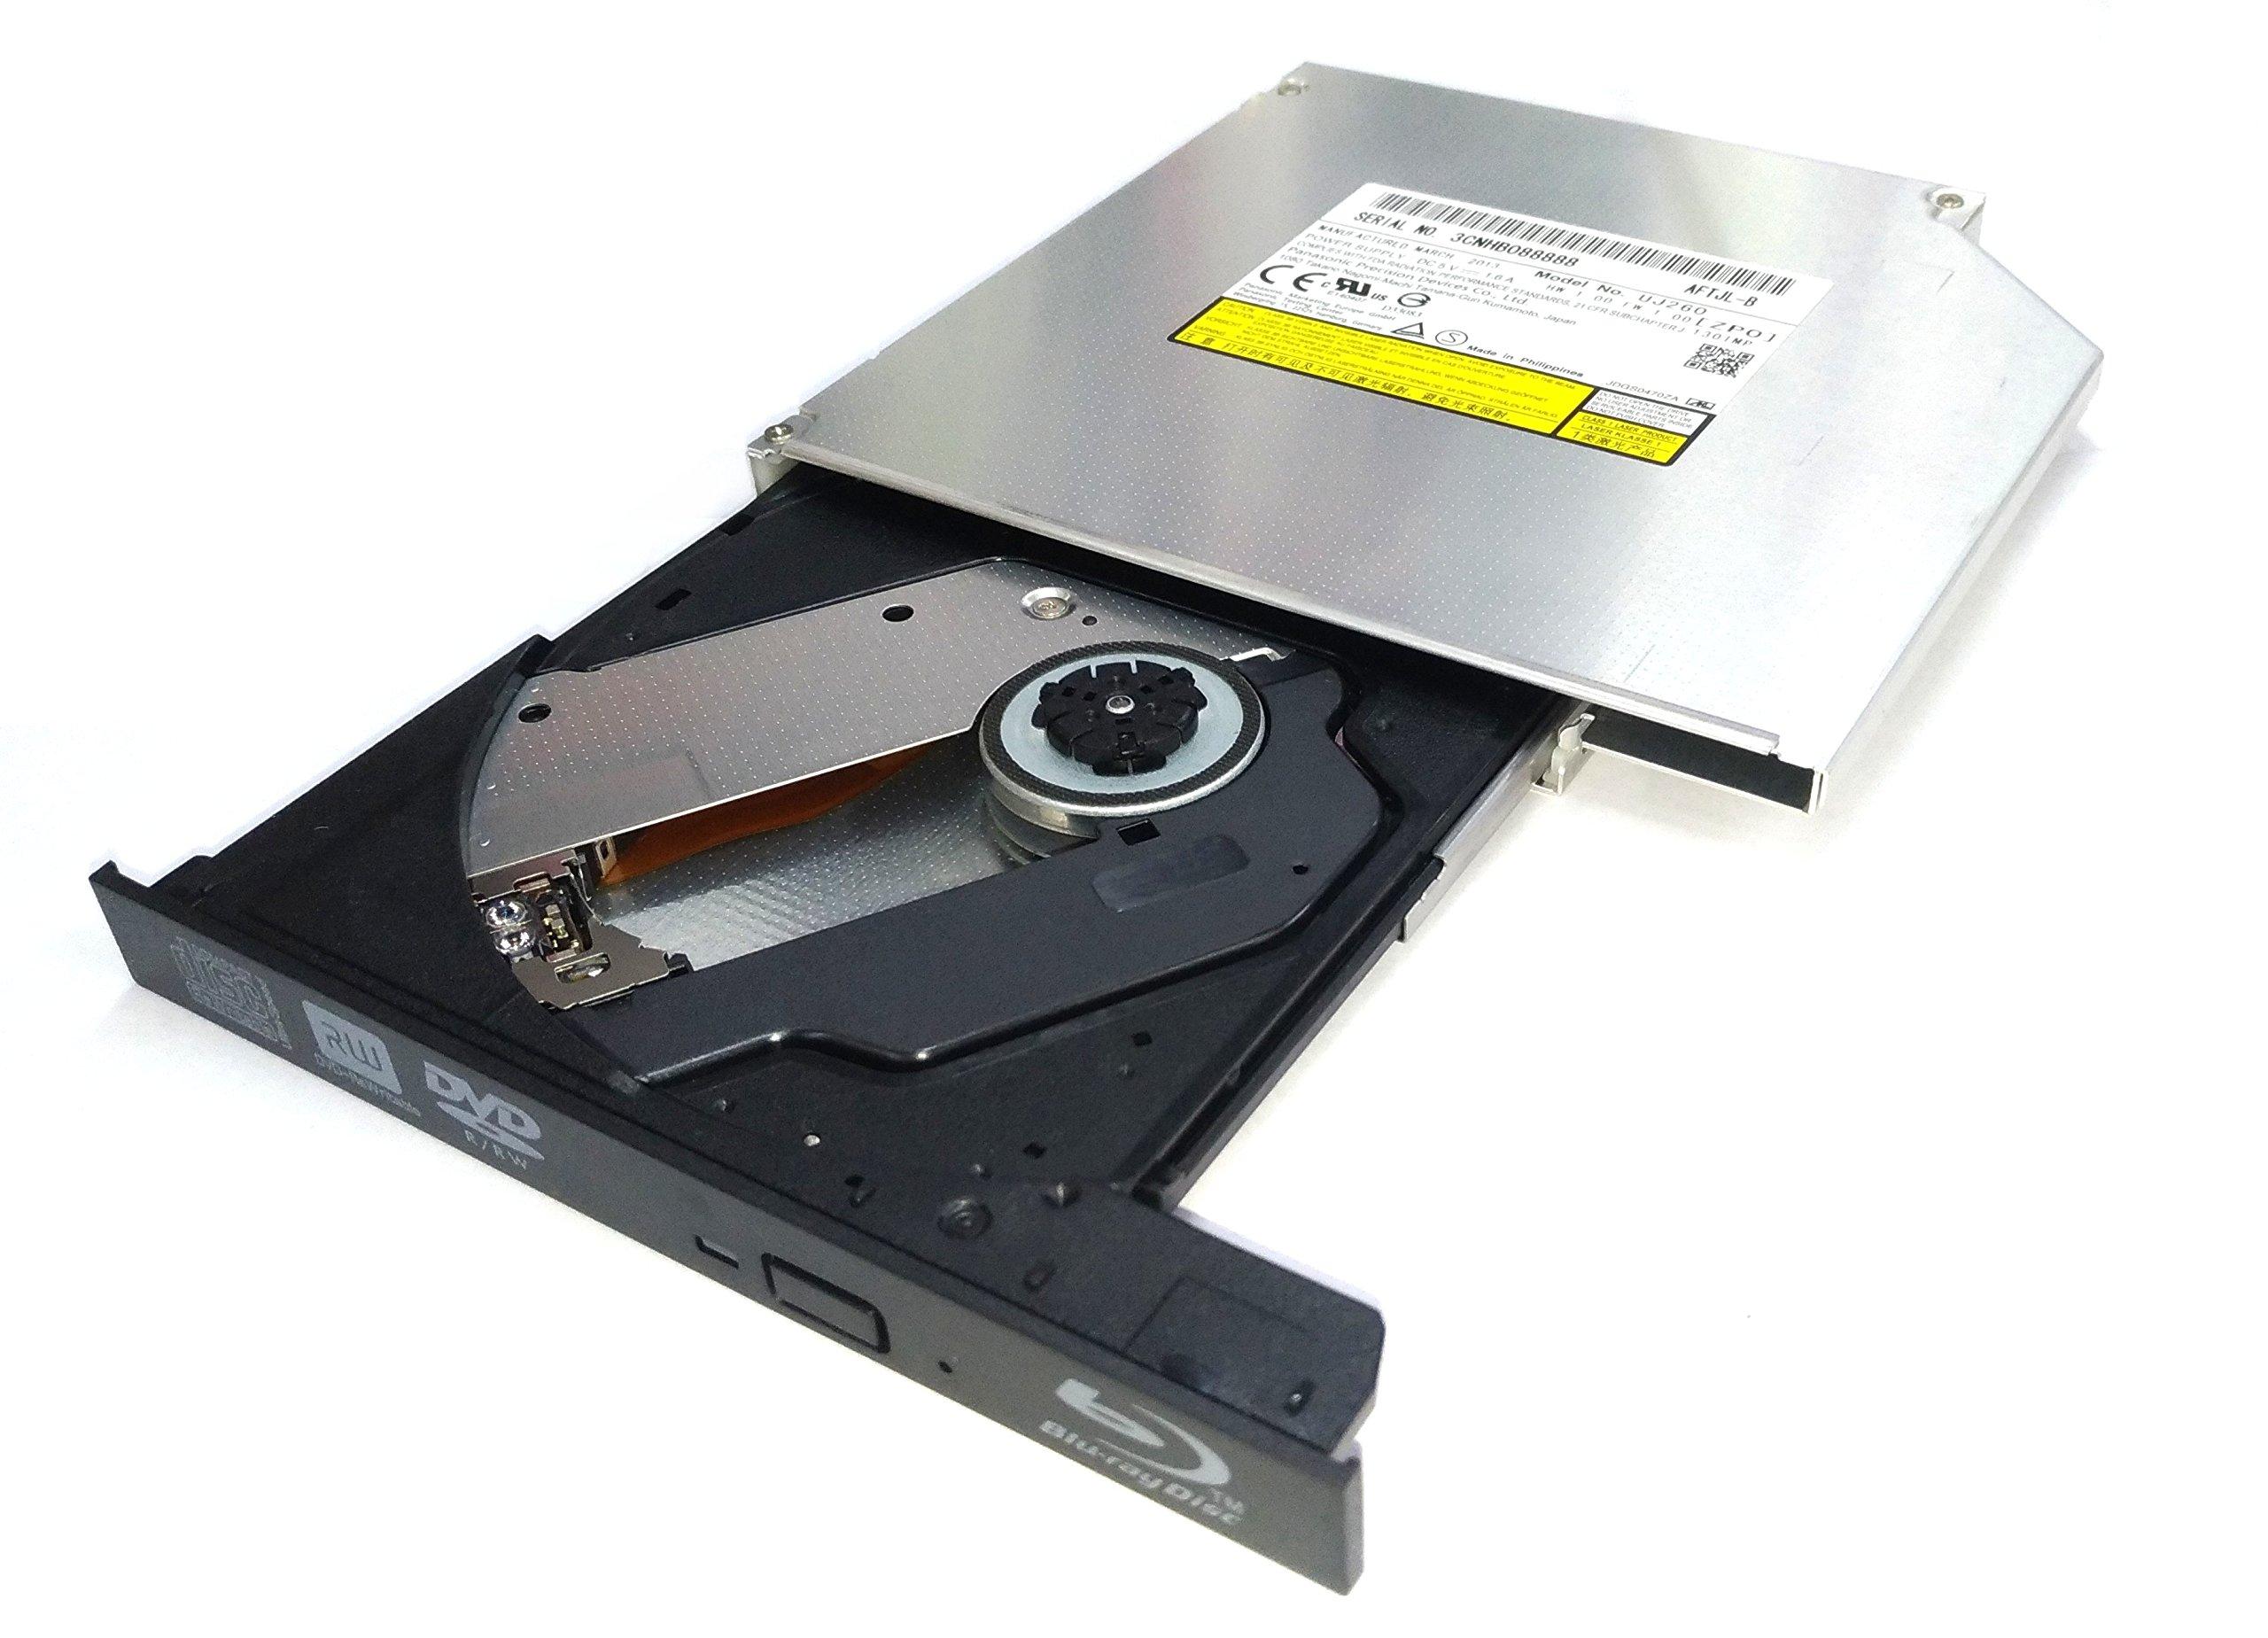 HAZYYO Laptop Internal UJ-260 UJ260 12.7mm SATA 6X Blu-ray Burner BD-RE BDXL DL Dual Layer Bluray Recorder Super Slim Internal Optical Drive by HAZYYO